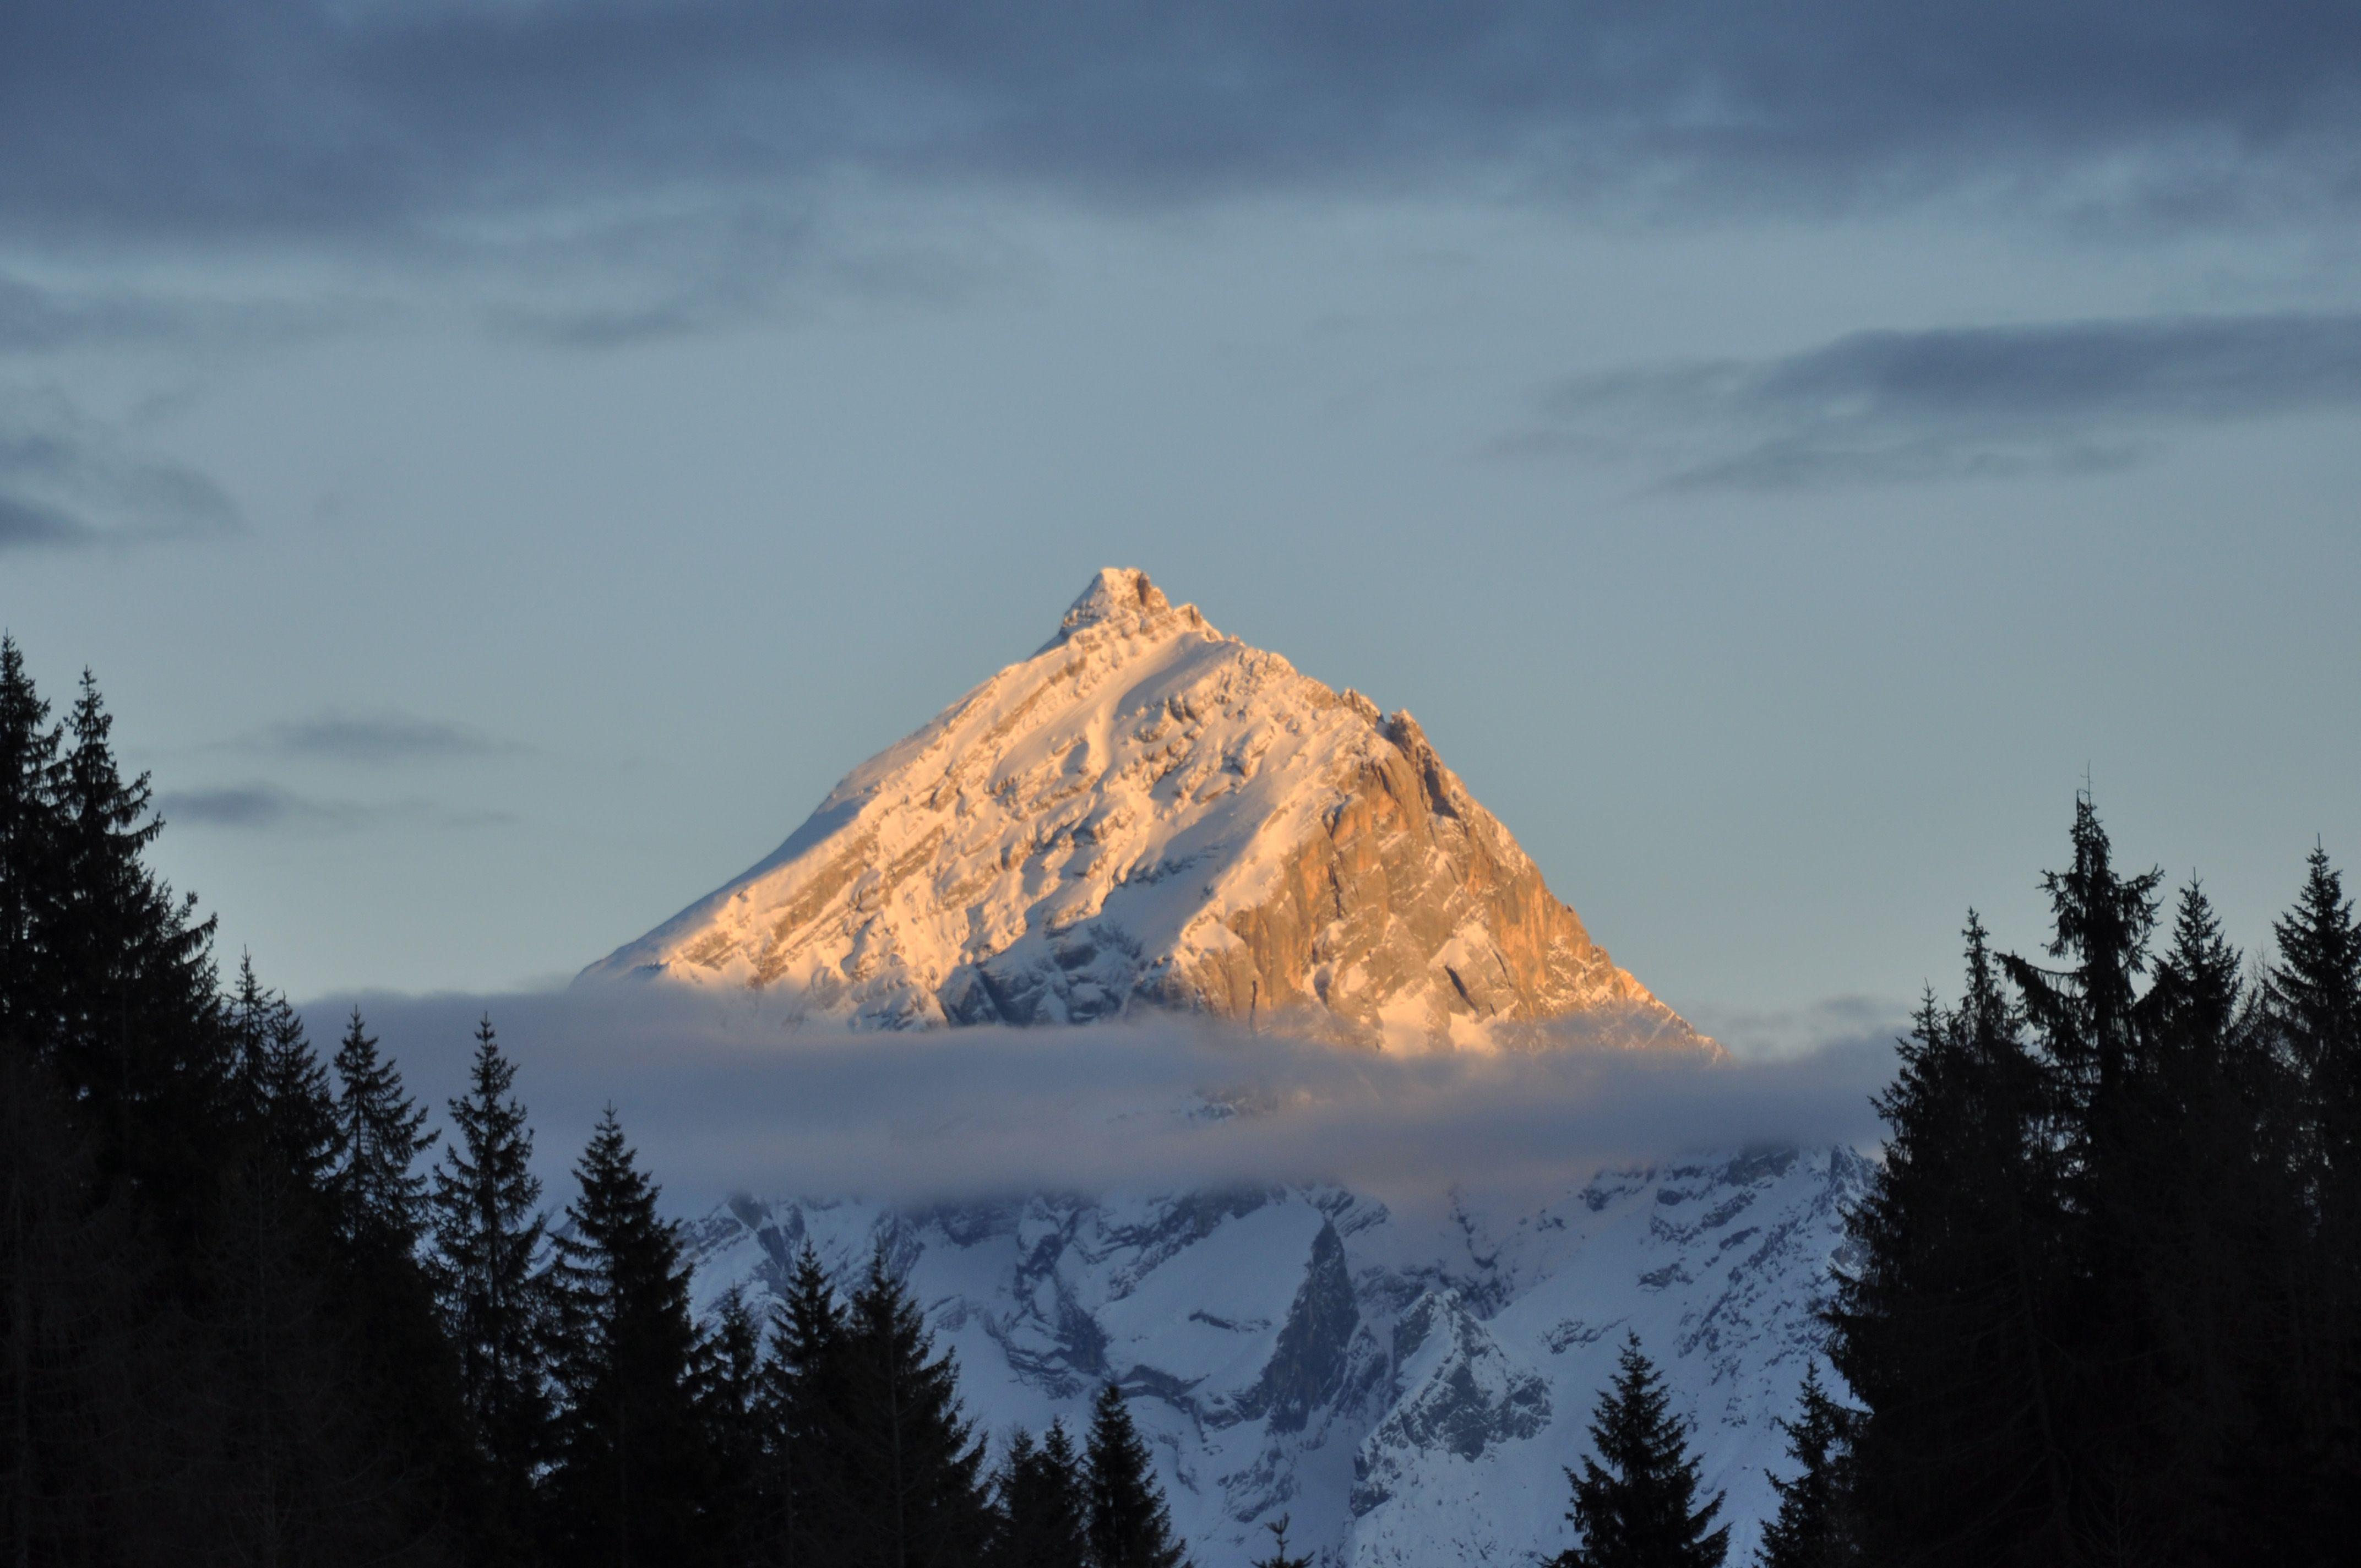 Mt. Antelao, Cortina d'Ampezzo. Wonderland Pinterest